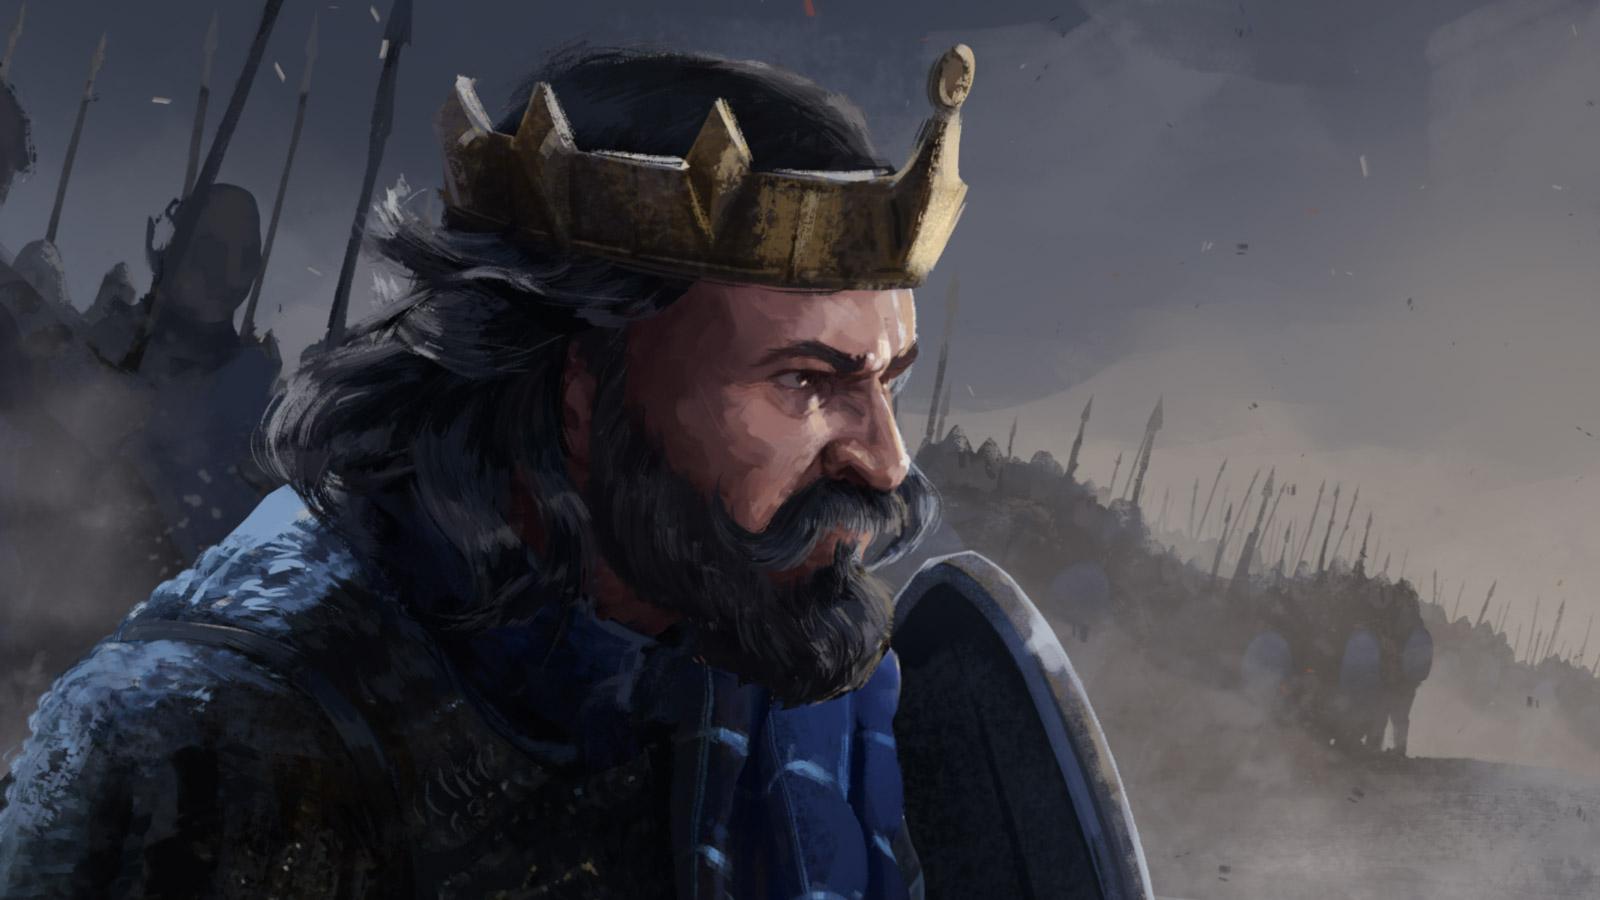 Free Total War Saga: Thrones of Britannia Wallpaper in 1600x900